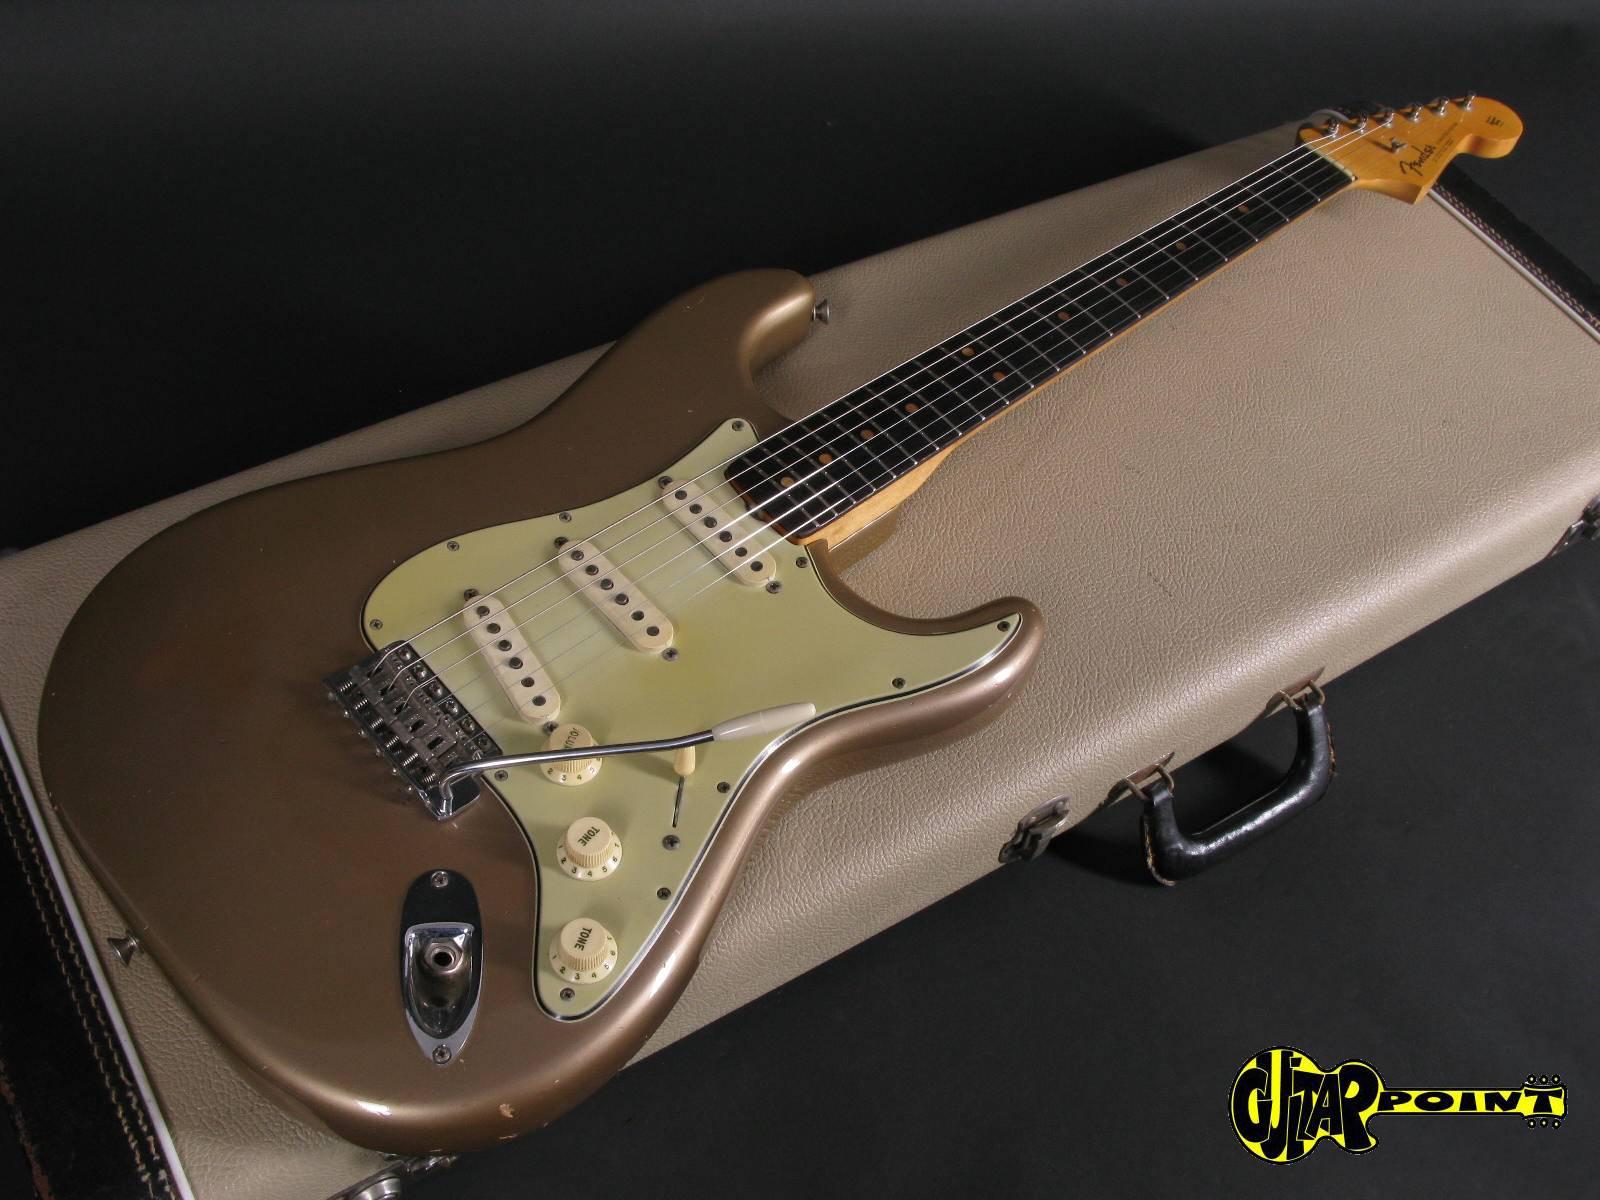 1963 Fender Stratocaster - Fiesta Red-Vi63FeStrFstaRed_L01152